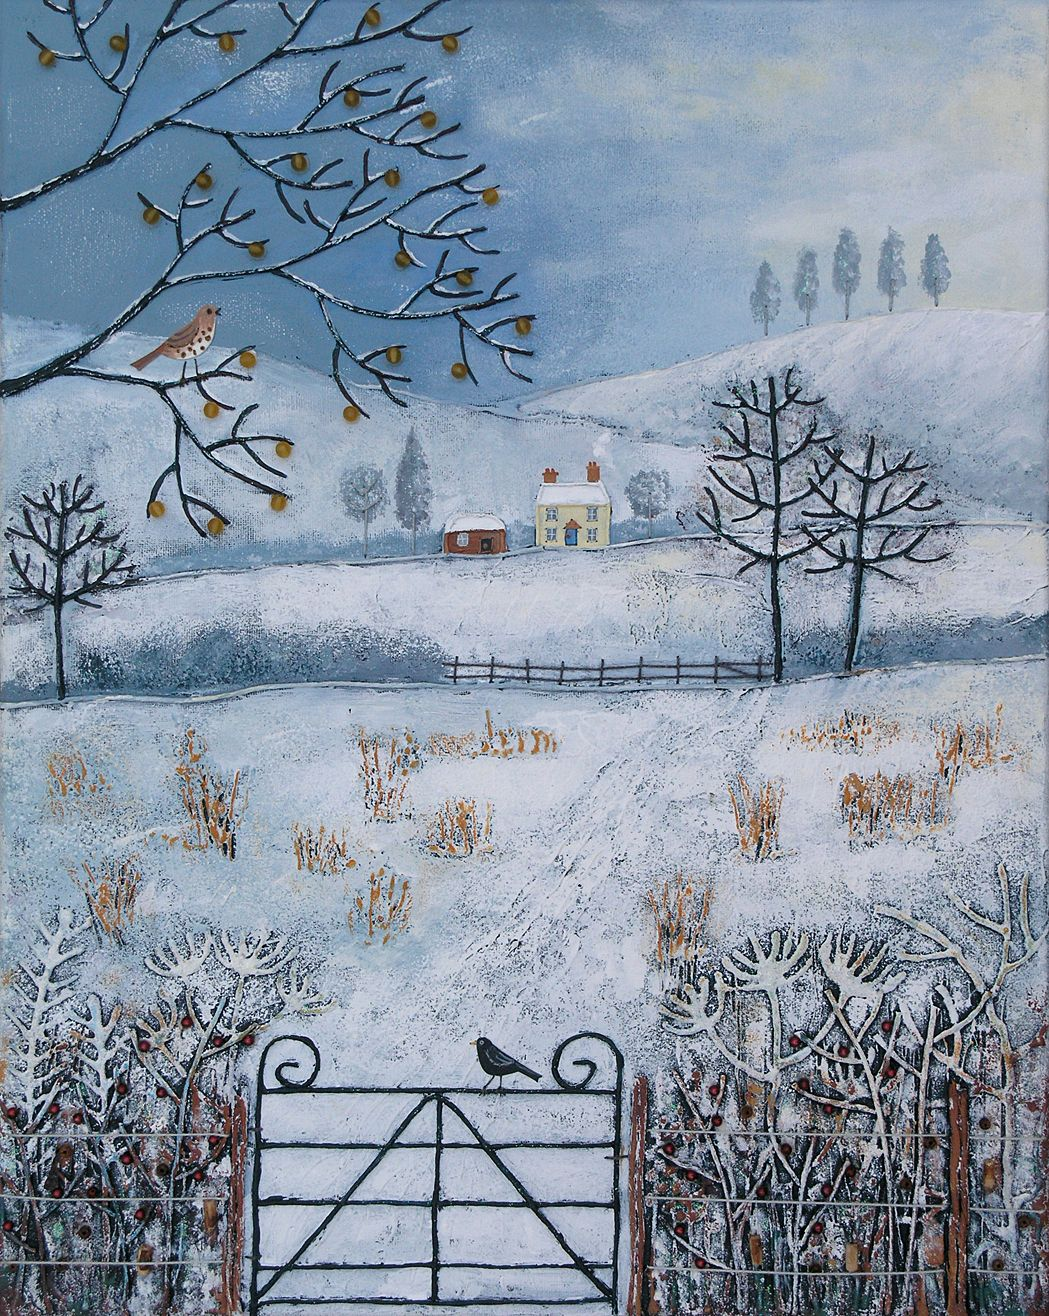 Pin By Fiona Guglielmi On My Art The Four Seasons Art Naive Art Winter Art